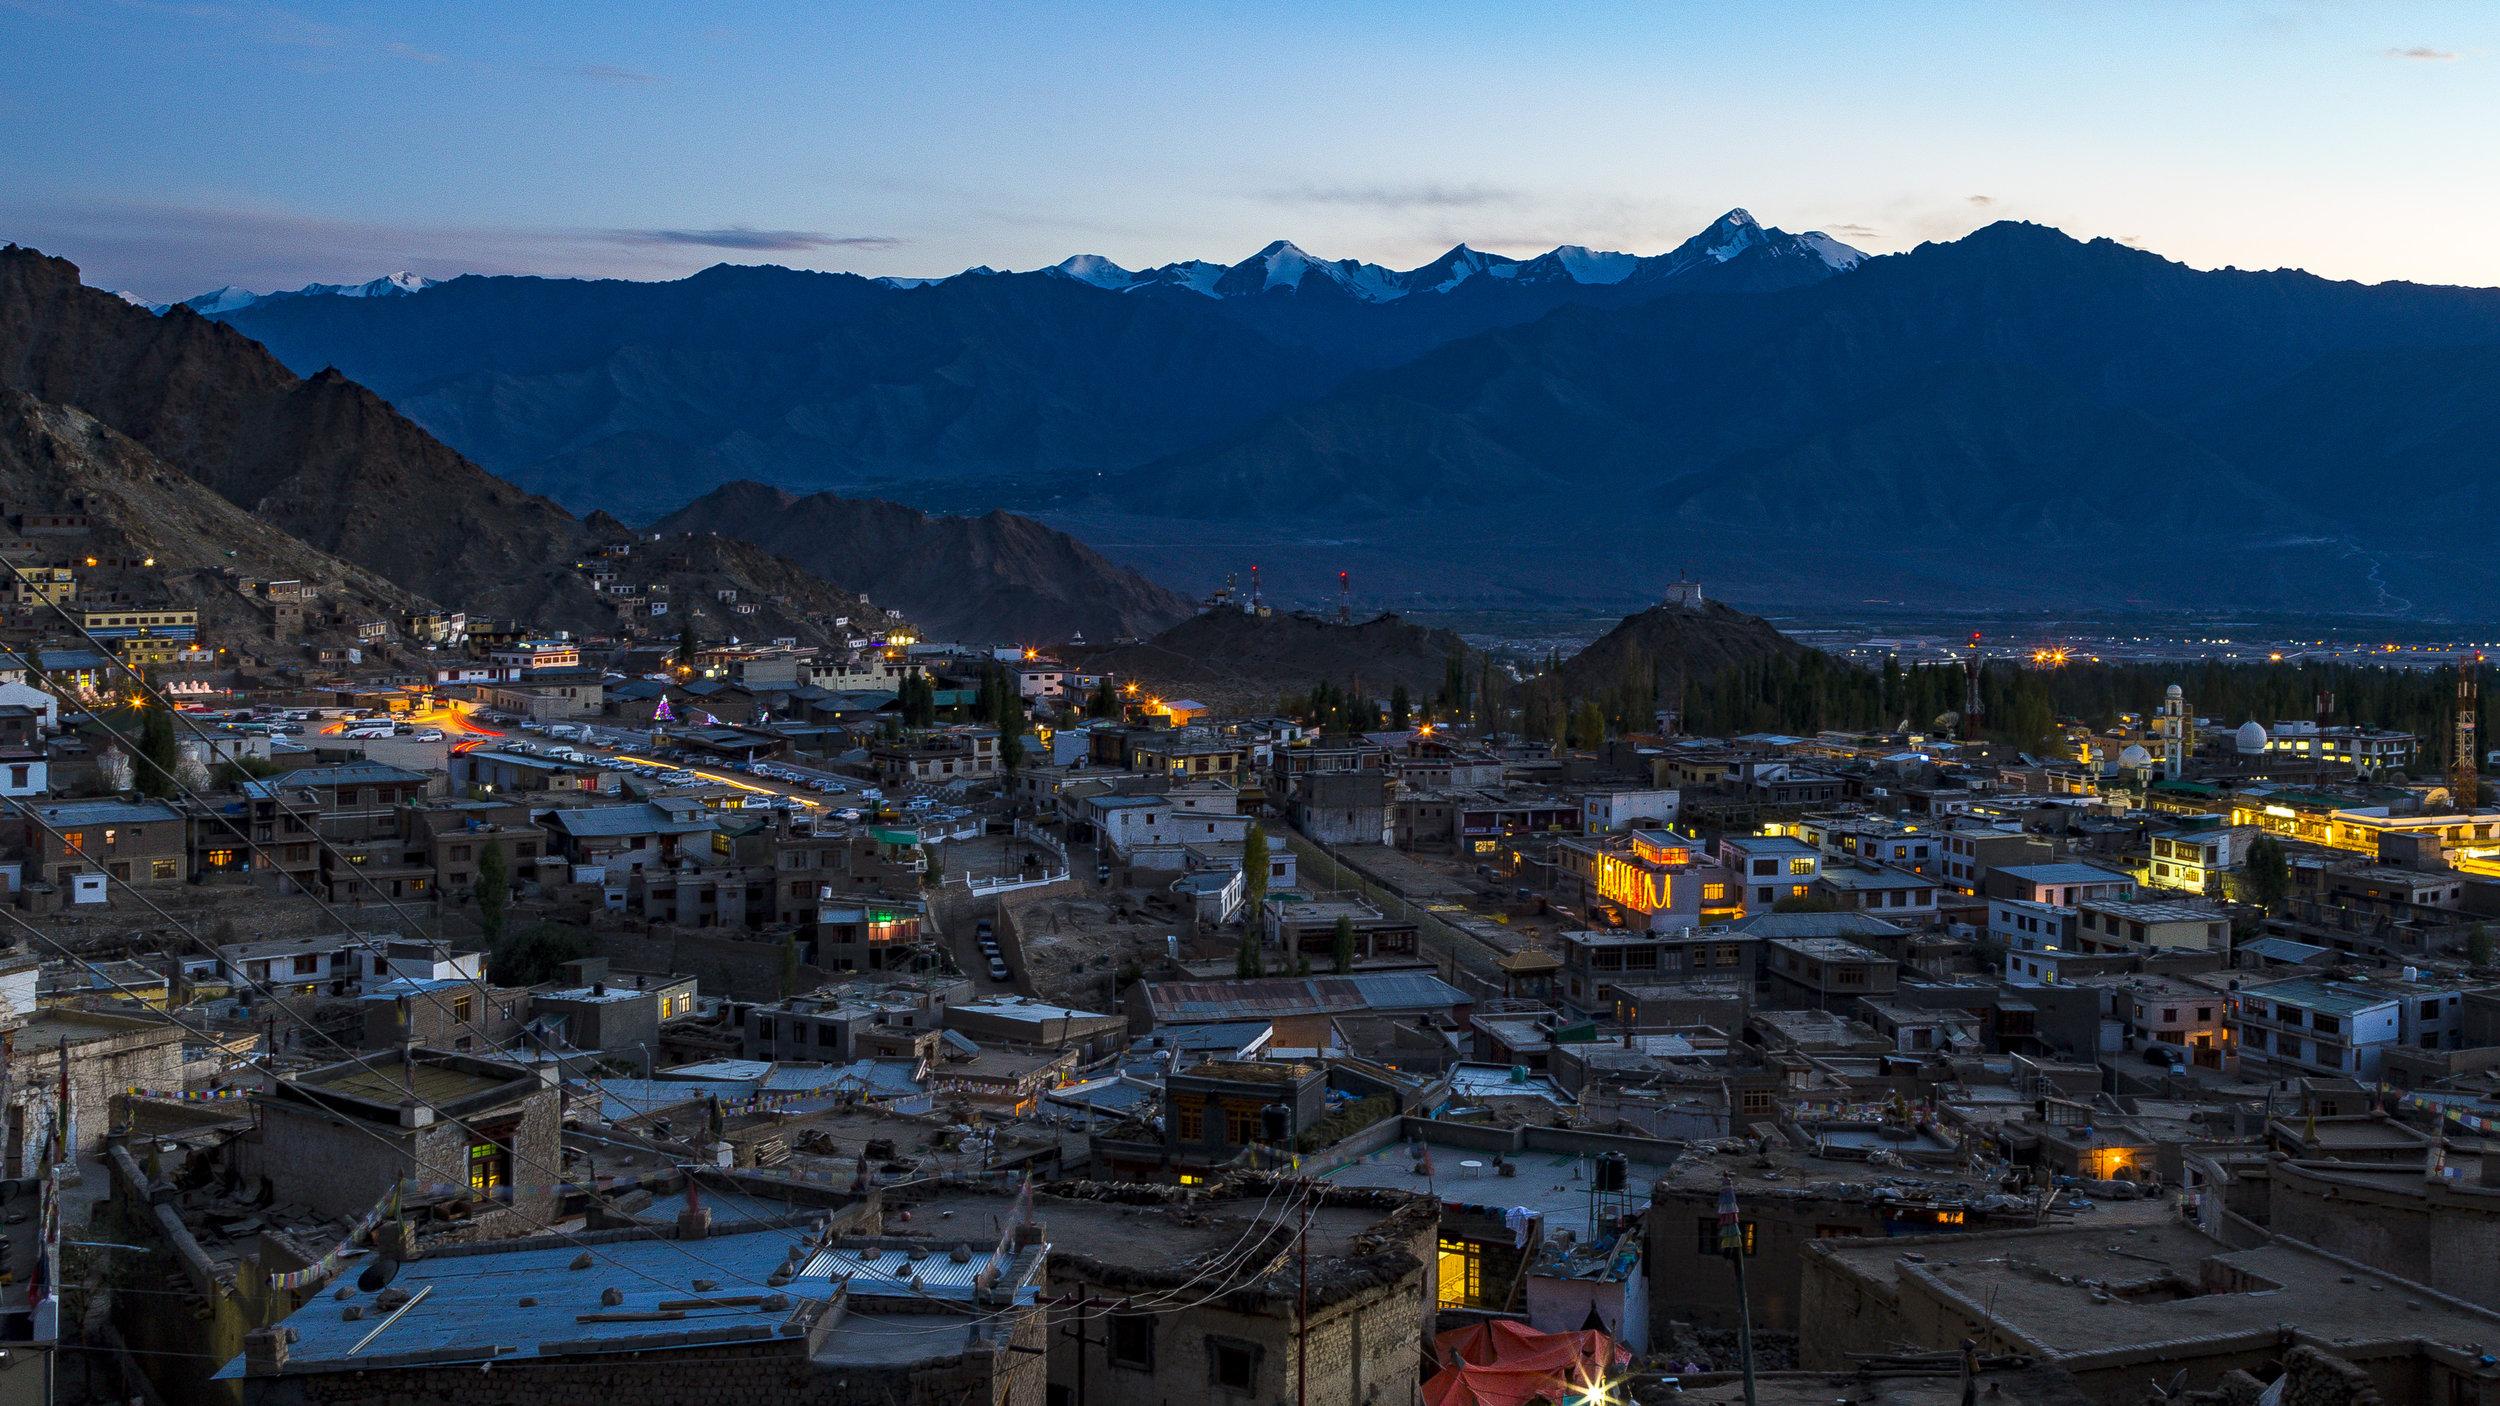 Leh Town at dusk